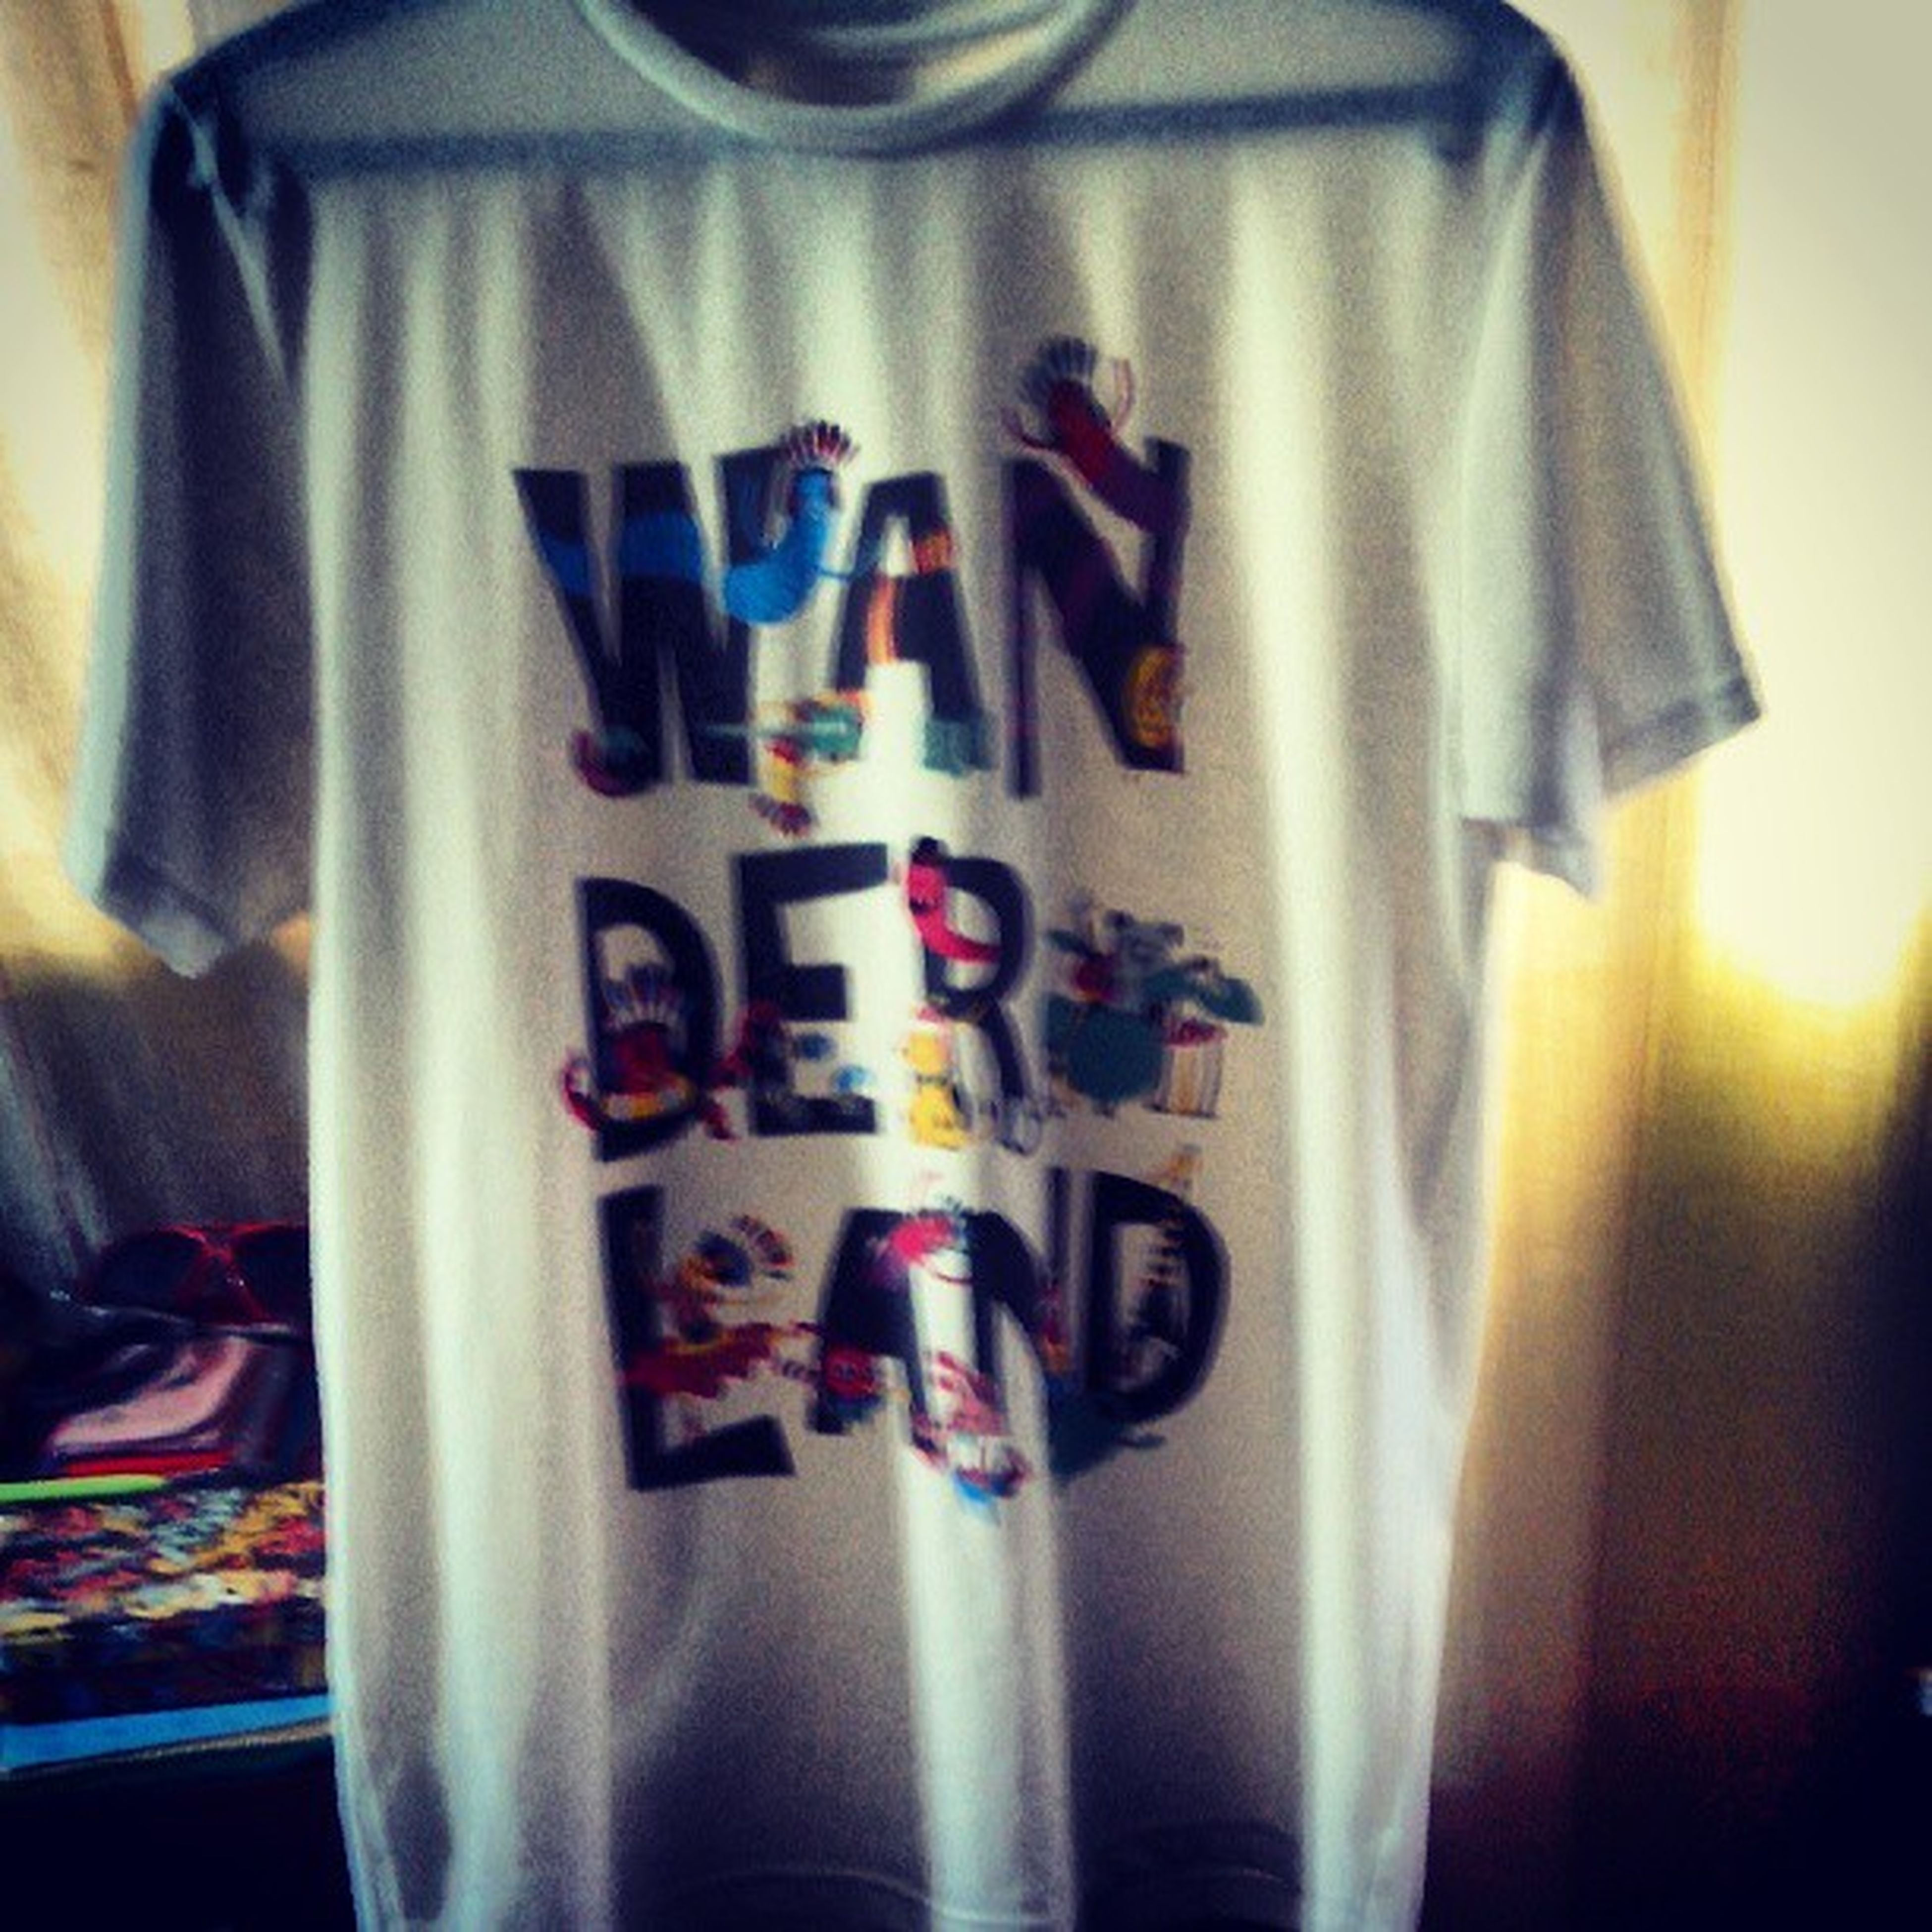 Wanderlandmusicfest shirt :) Wanderland2013